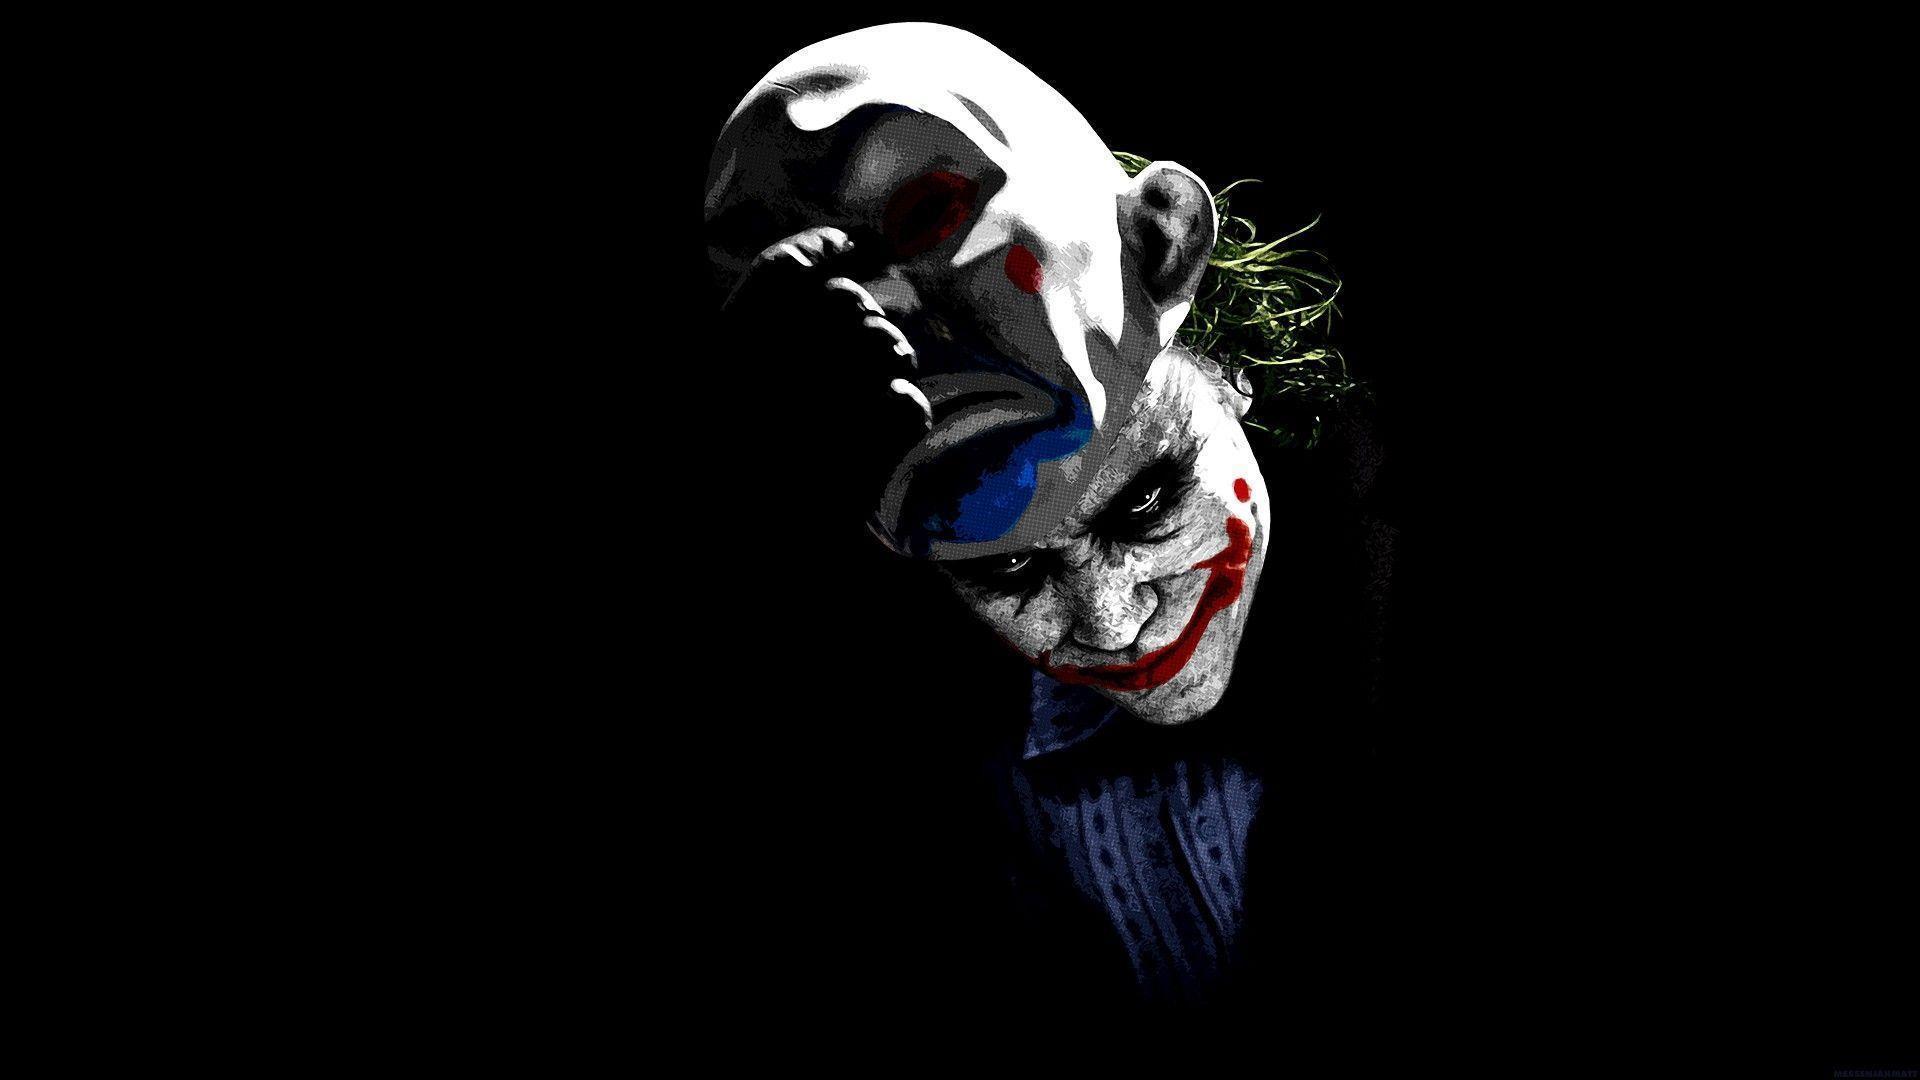 Evil clown wallpapers wallpaper cave - Circus joker wallpaper ...